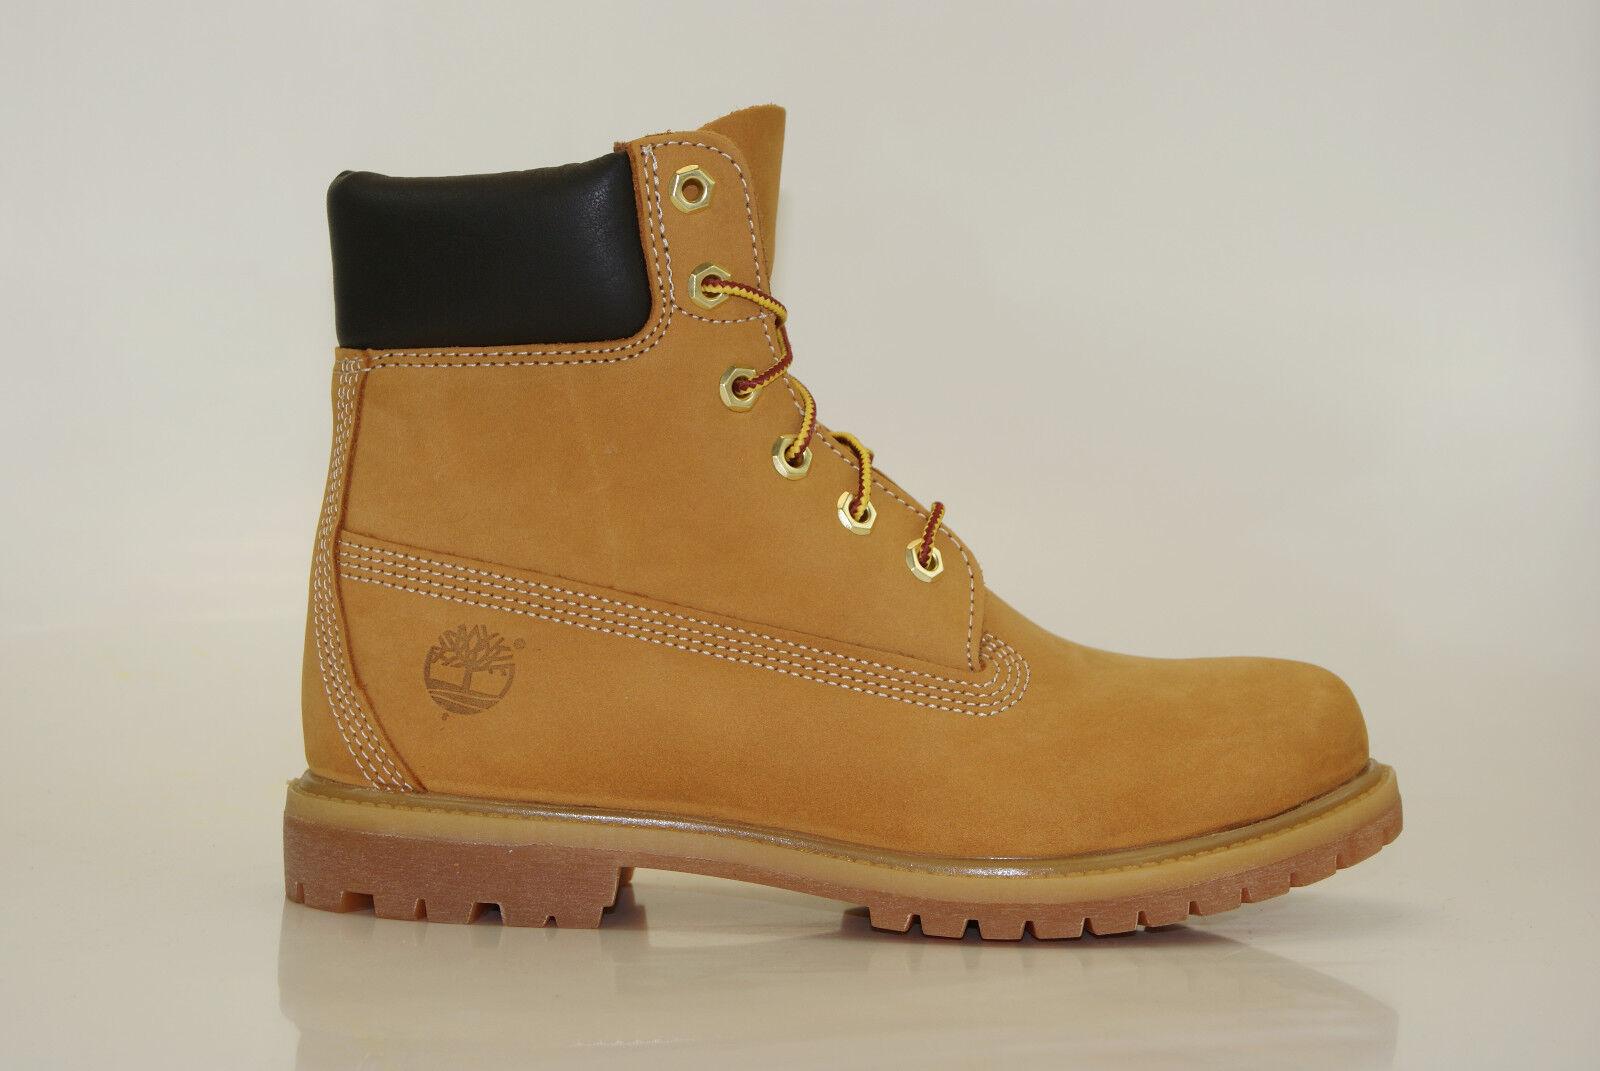 bester Großhändler San Francisco am beliebtesten Женские сапоги или ботинки Timberland Icon 6 Inch Premium Boots Gr 42 US 11  Waterproof Damen Stiefel 10361